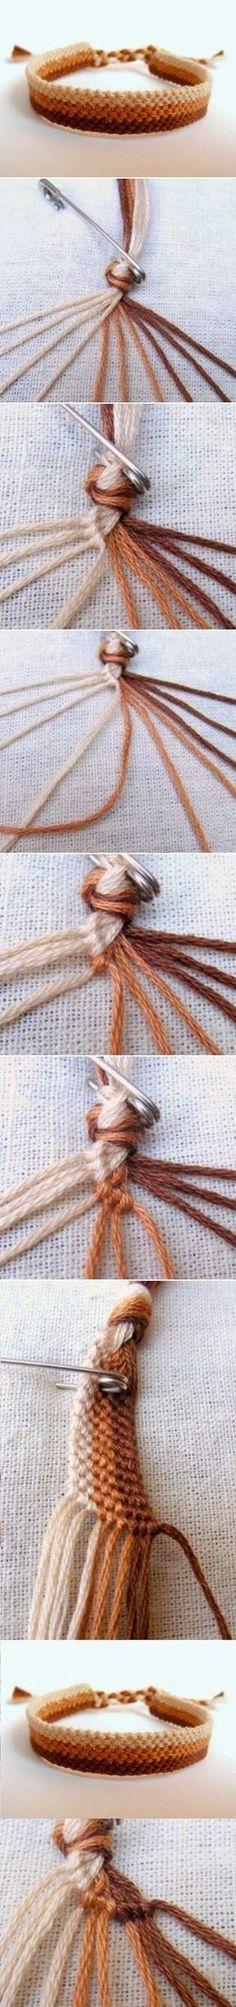 DIY : Easy Weave Bracelet | DIY & Crafts Tutorials #DIY by bleu.